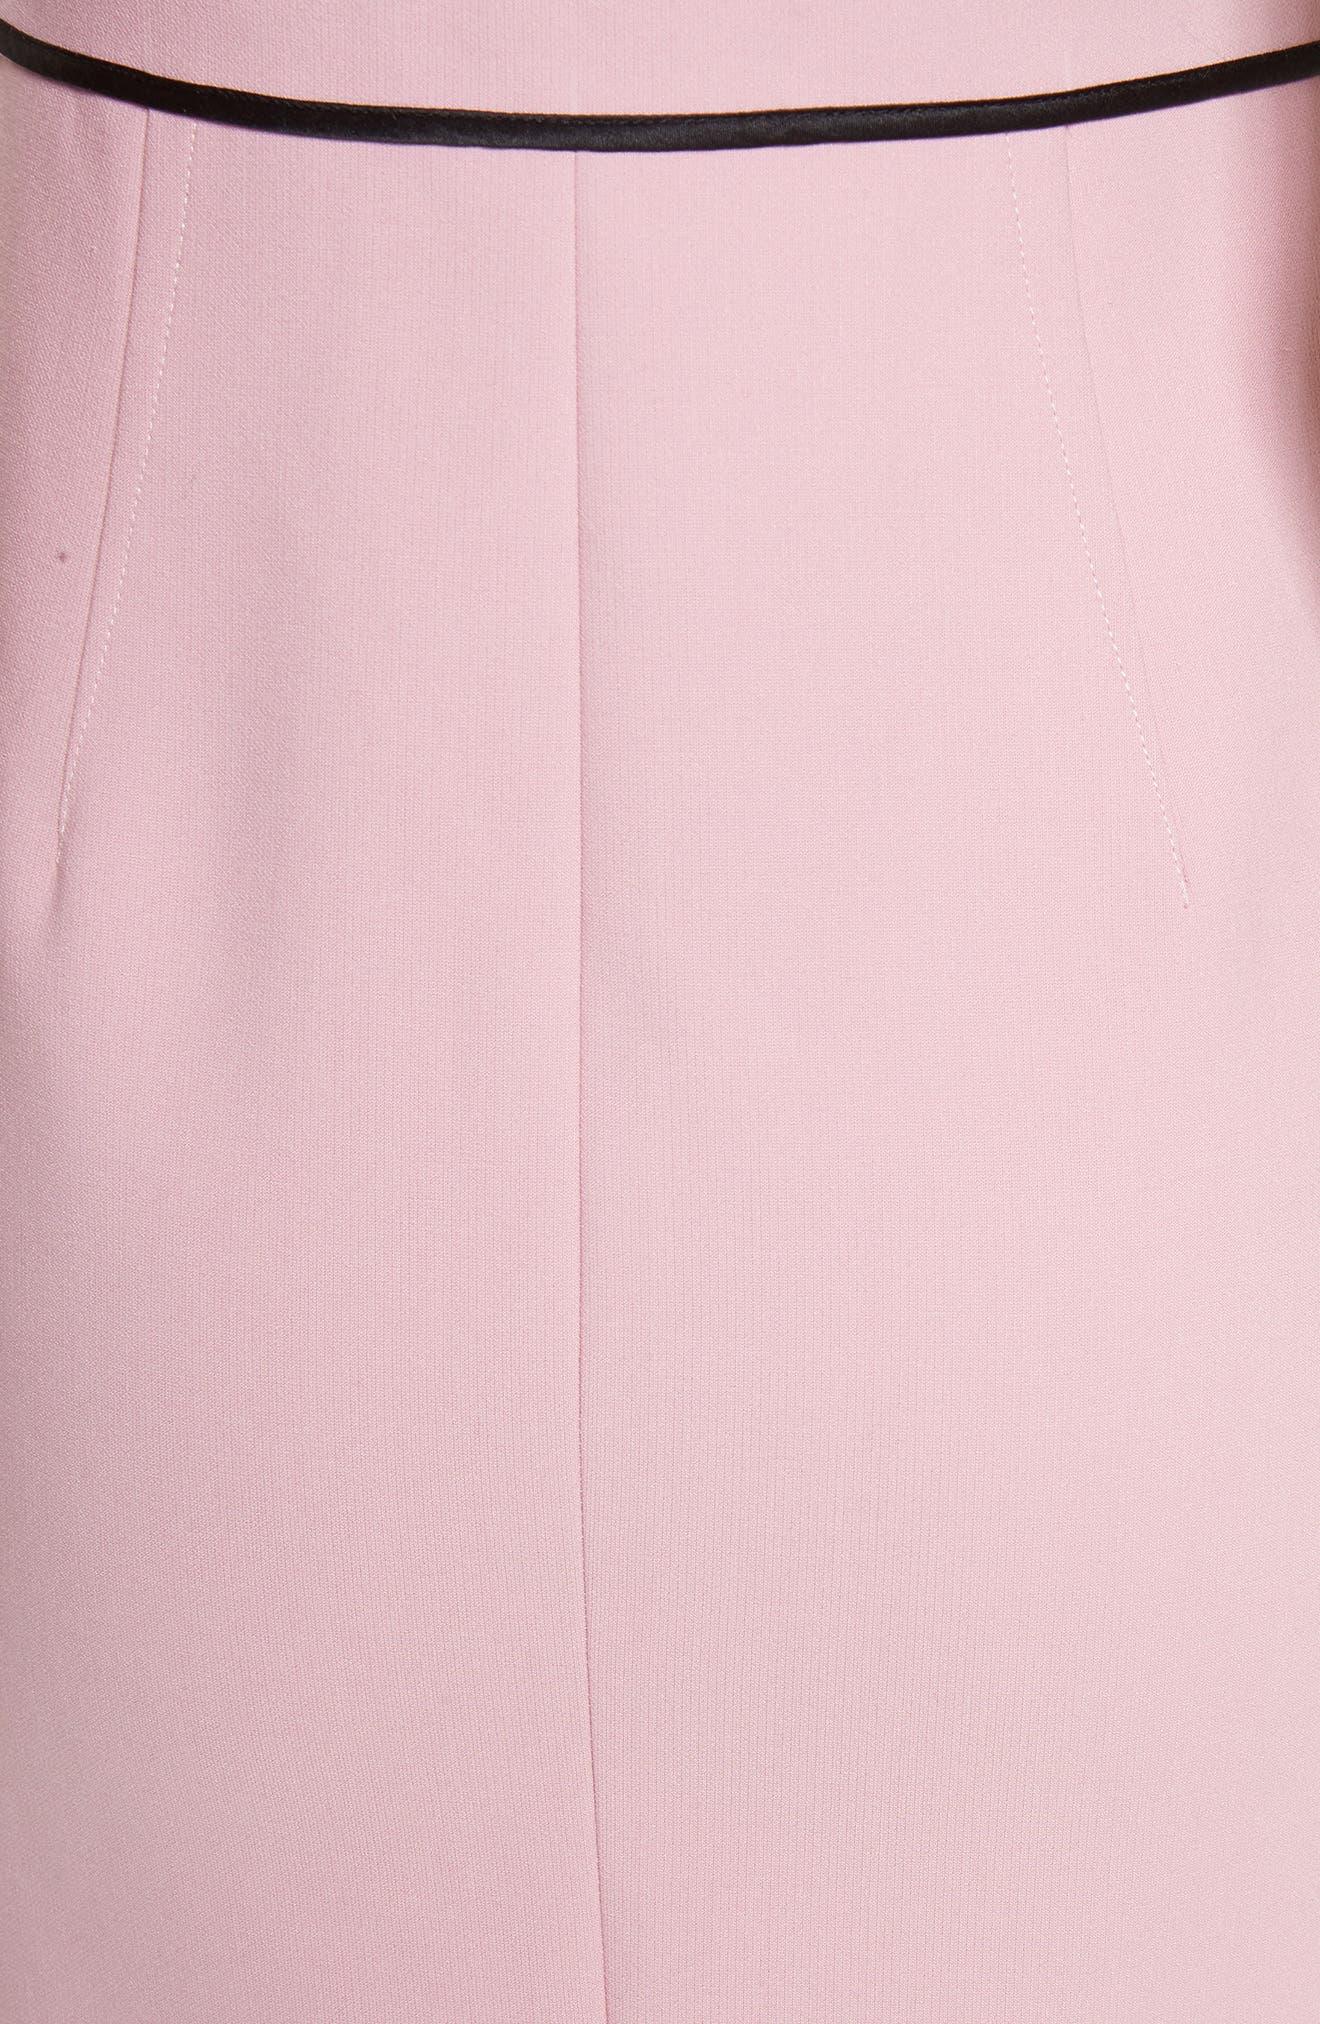 Lida Sheath Dress,                             Alternate thumbnail 10, color,